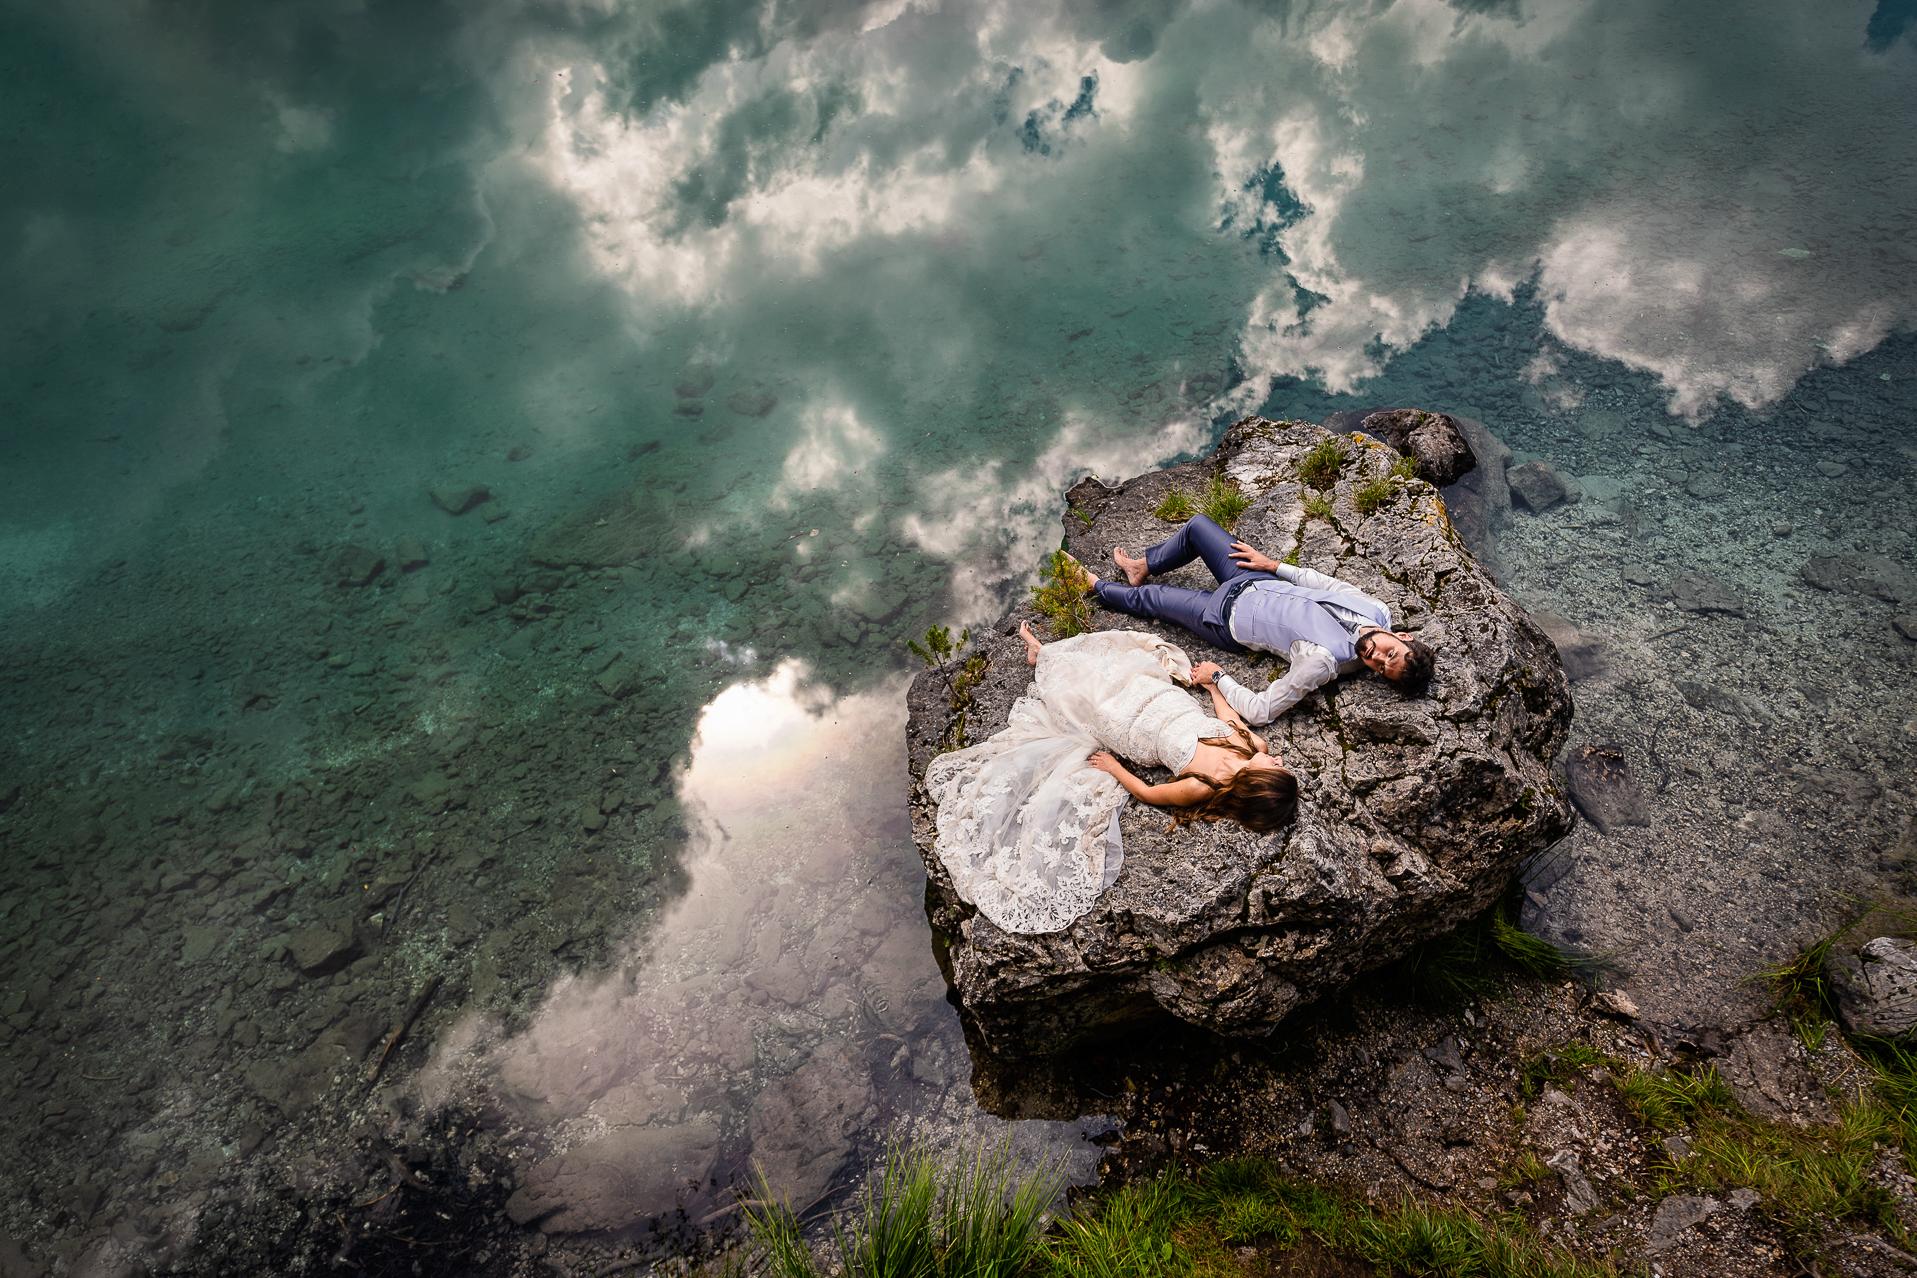 fotografo vicenza - trash the dress lago di braies